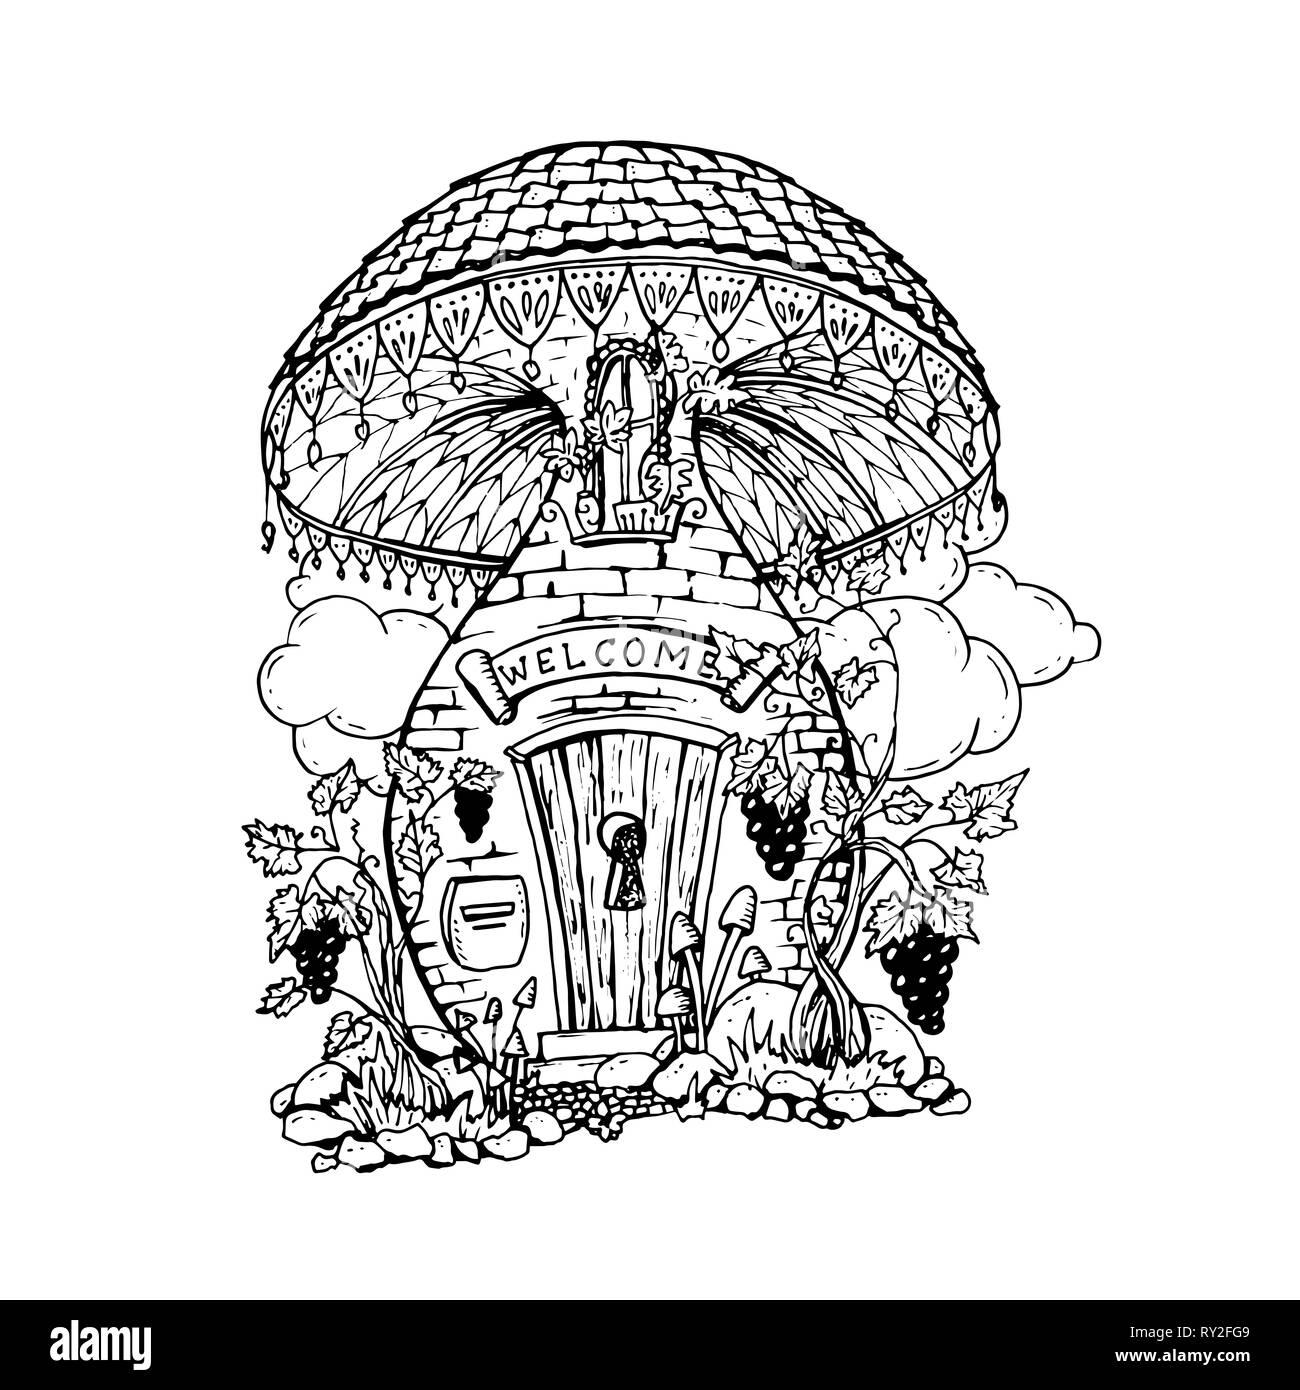 Mushroom house hand drawn illustration fairy composition